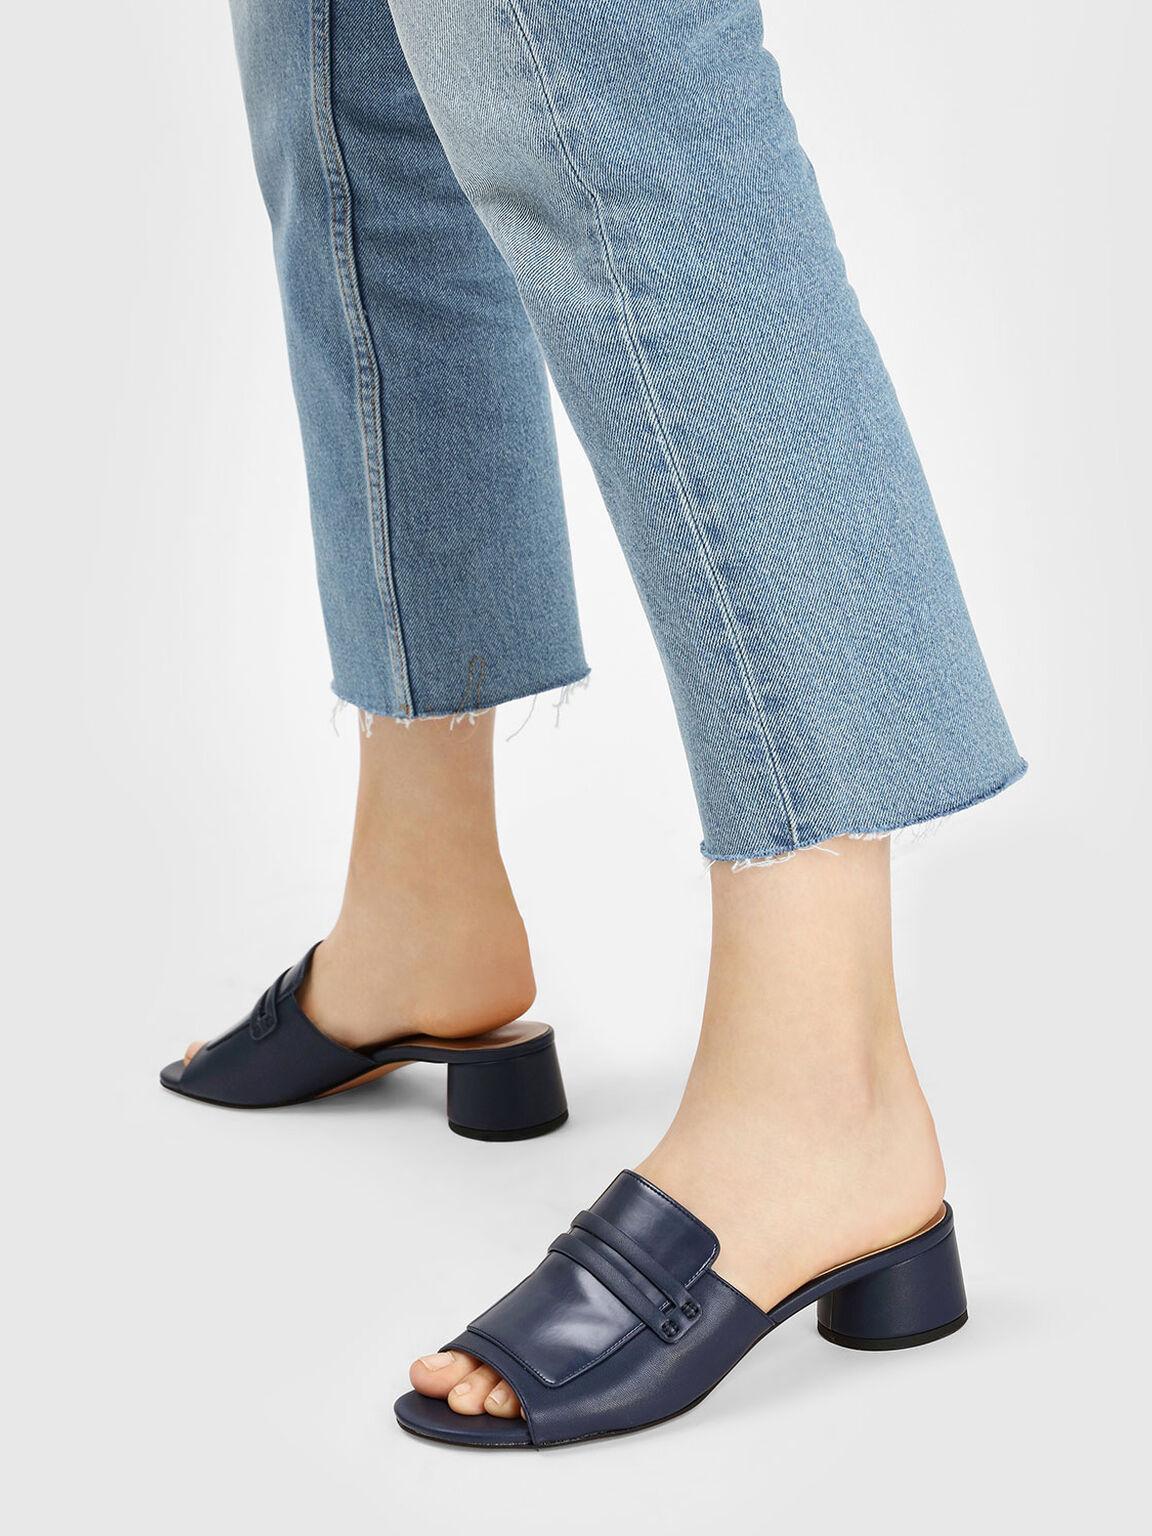 Cylindrical Block Heel Mules, Dark Blue, hi-res